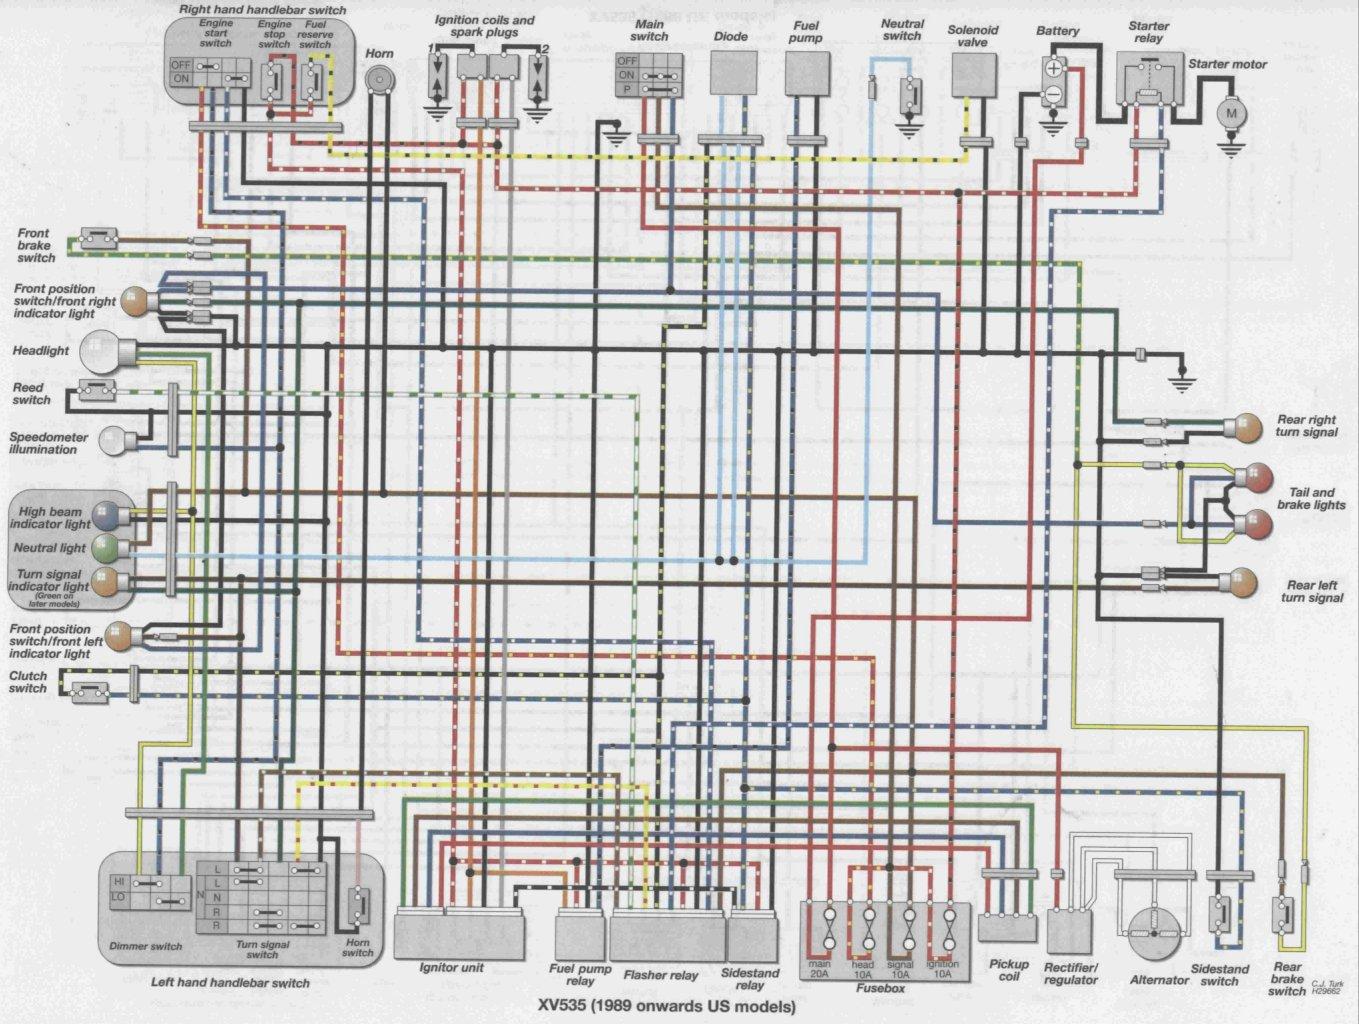 hight resolution of viragotechforum com u2022 view topic xv535sh wiring yamaha 1100 yamaha xvs1100 wiring diagram